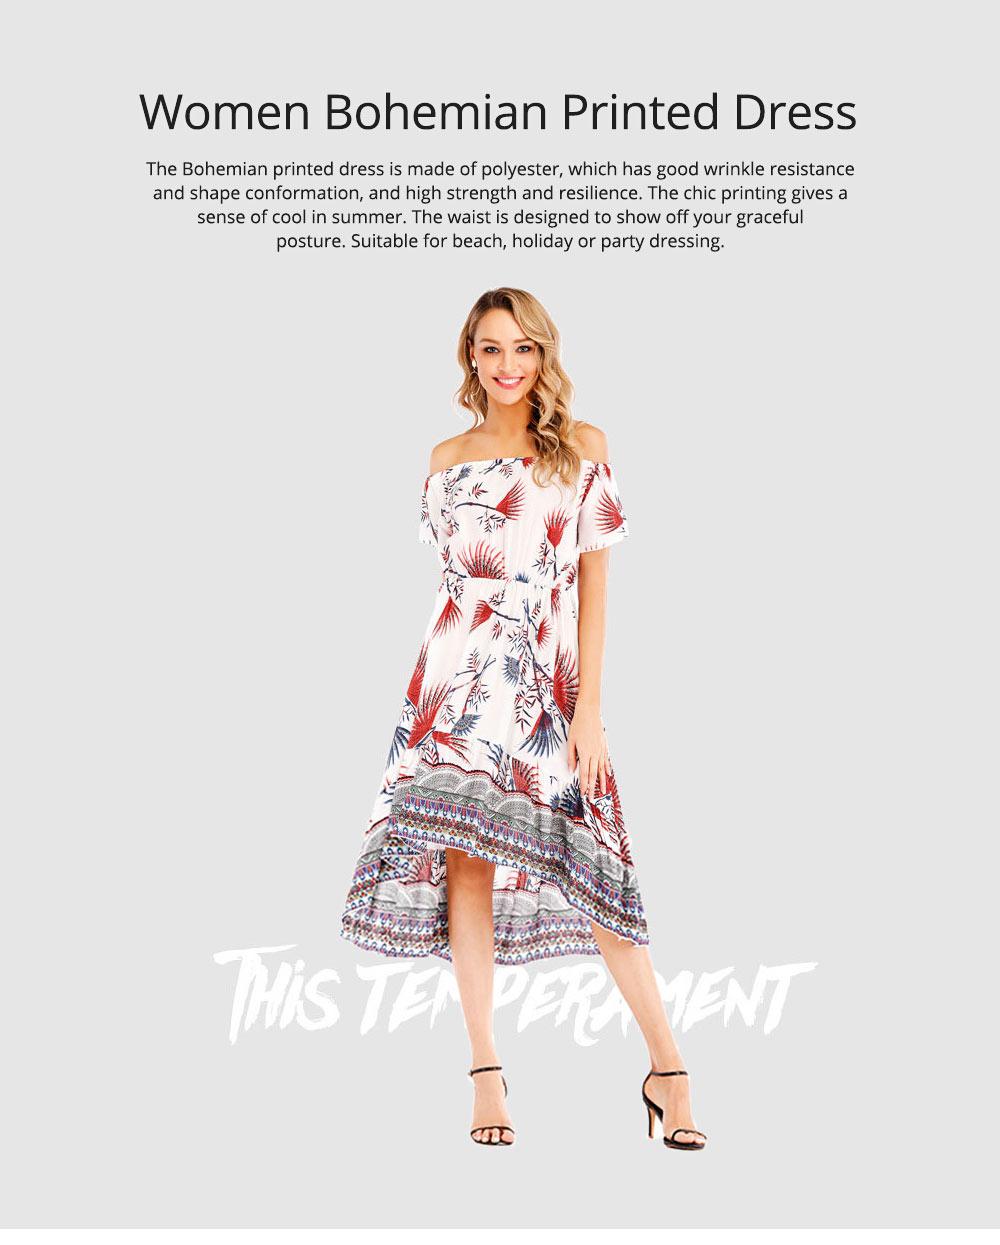 Holiday & Beach Dress for Women, Bohemian Print Dress, Sexy Off Shoulder Long Dress for Women 0